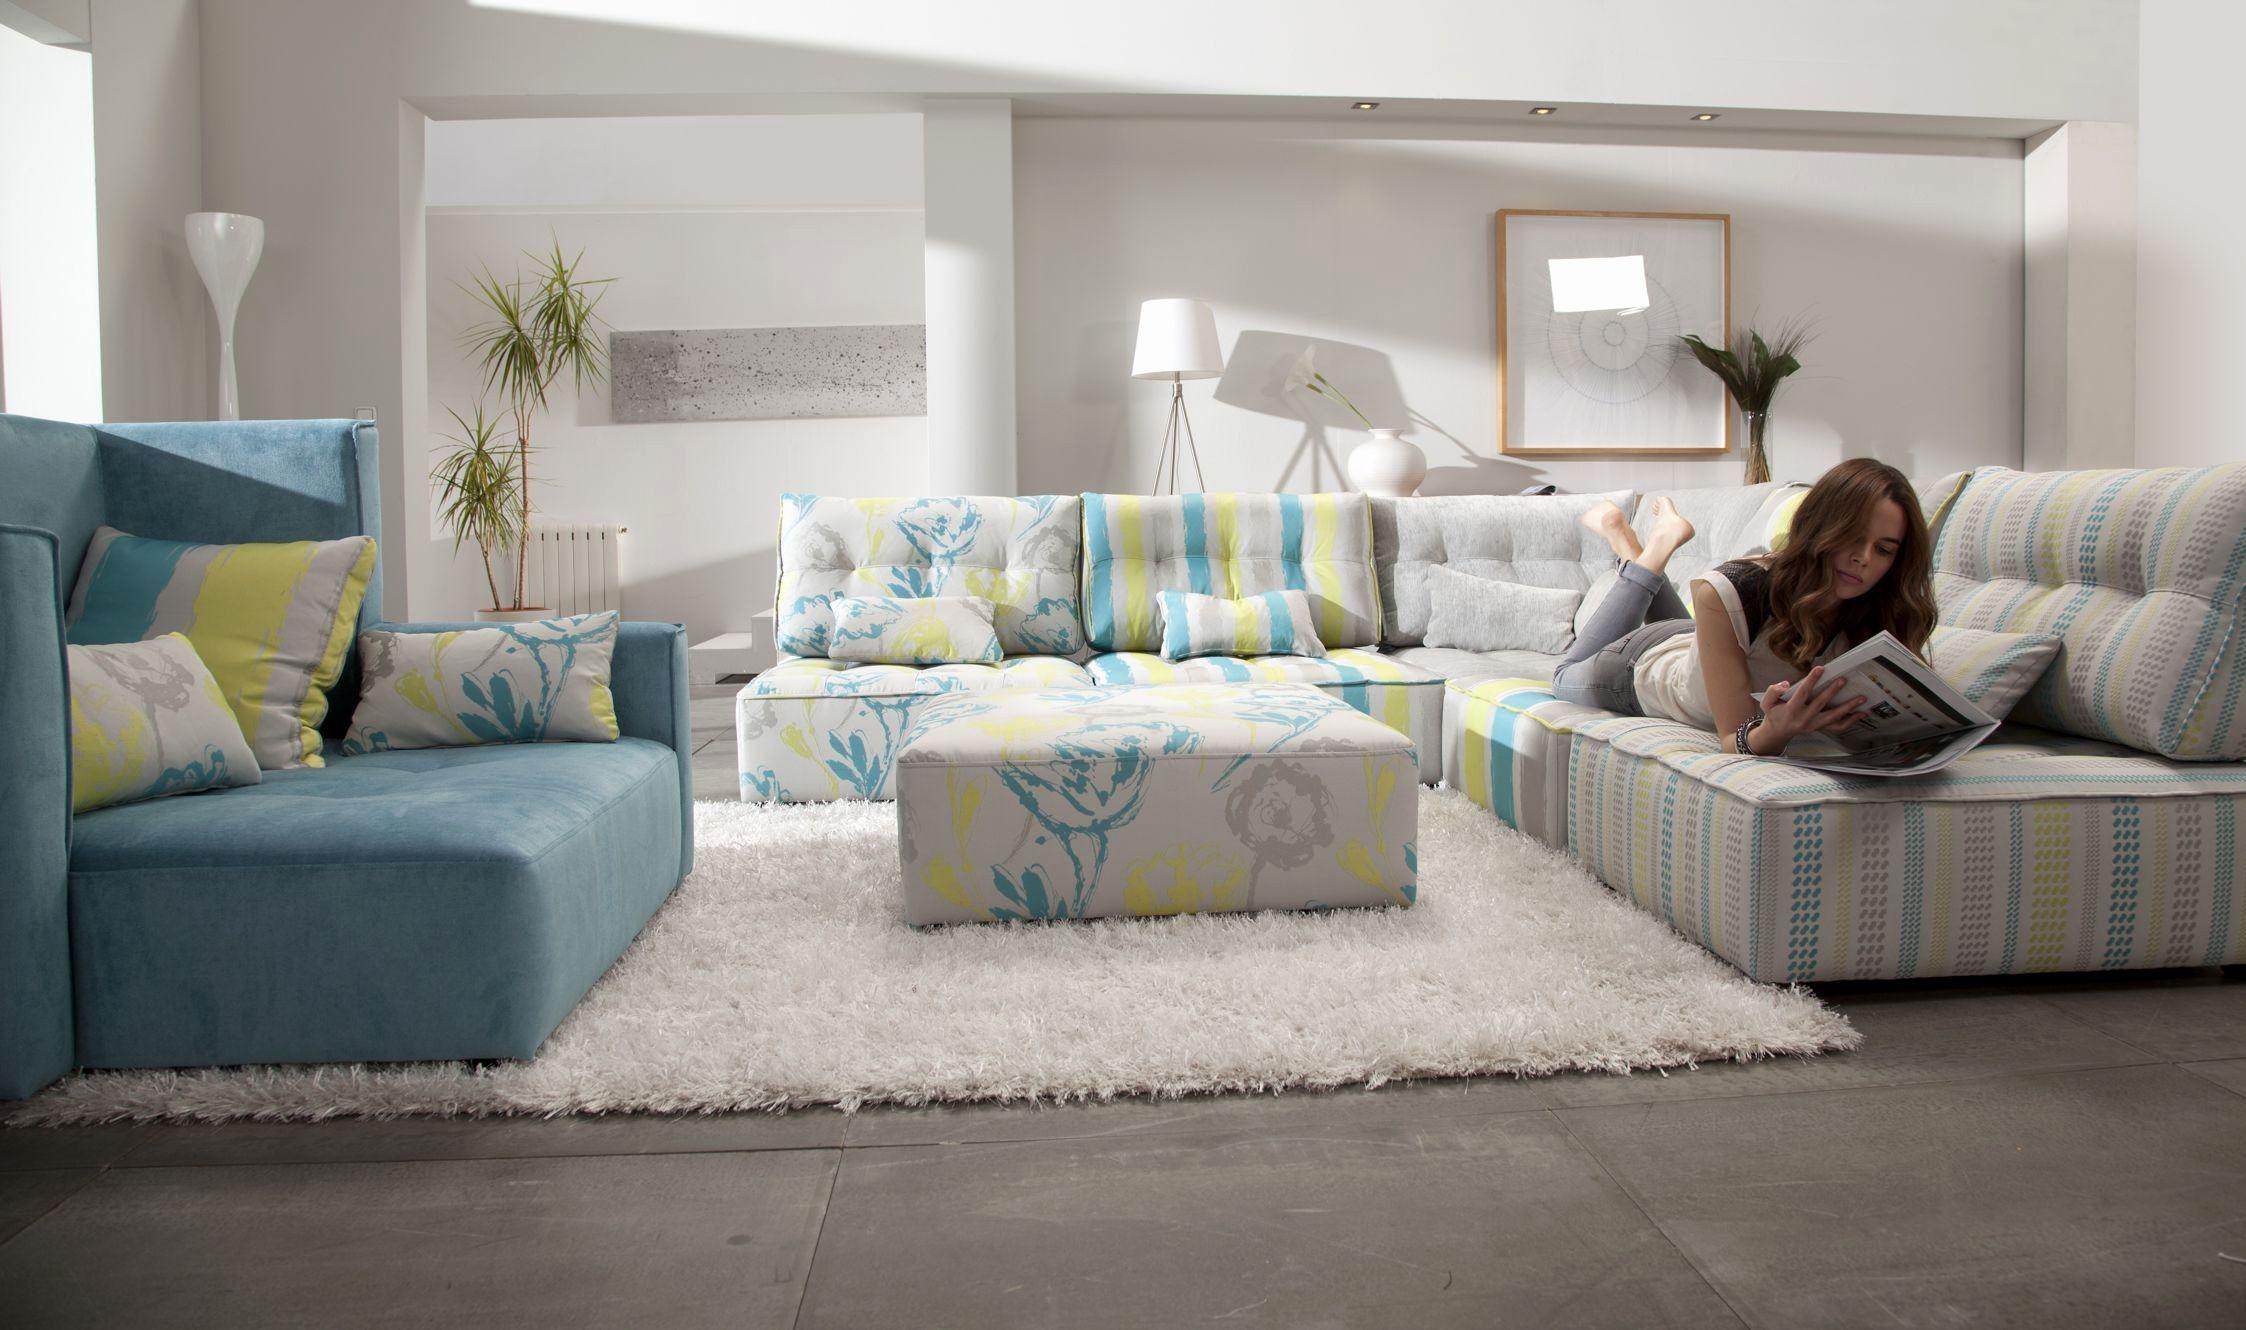 Idea Modular Sectional Sofa Pics Modular Sectional Sofa Luxury